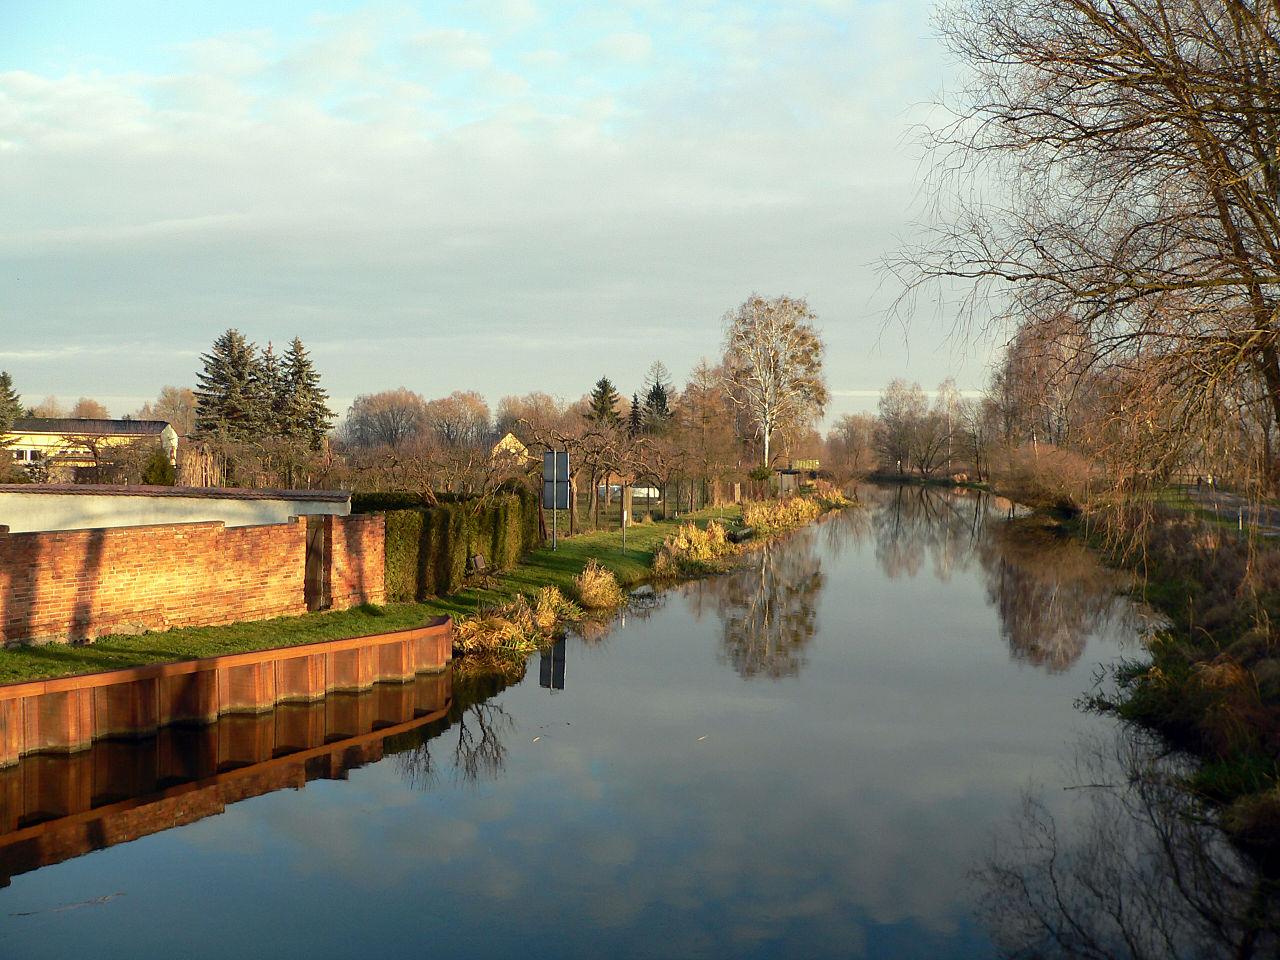 Bild Bootsfahrt auf den Finowkanal Eberswalde